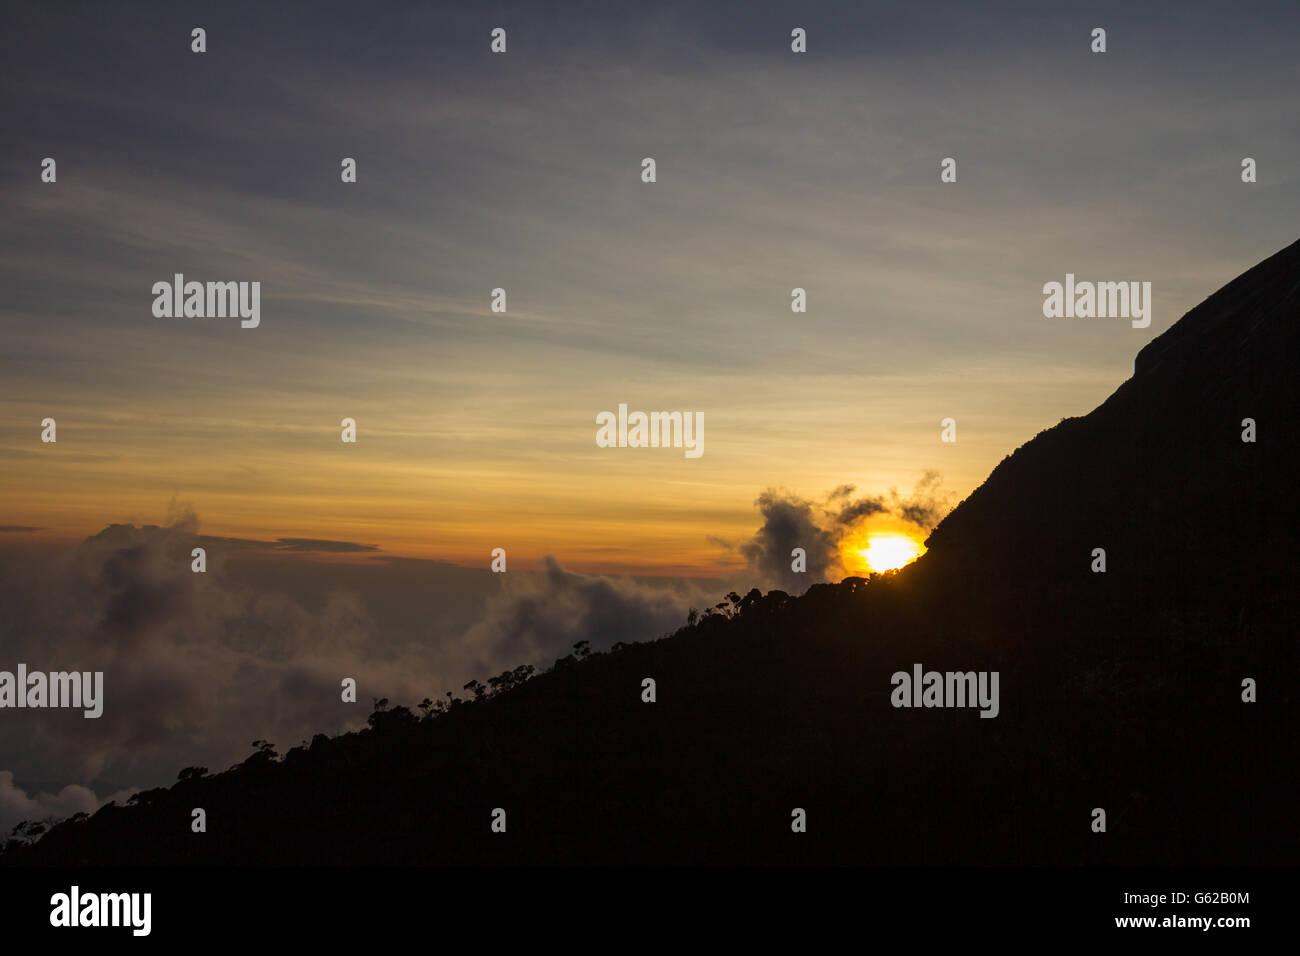 Sunset in Mount Kinabalu - Stock Image